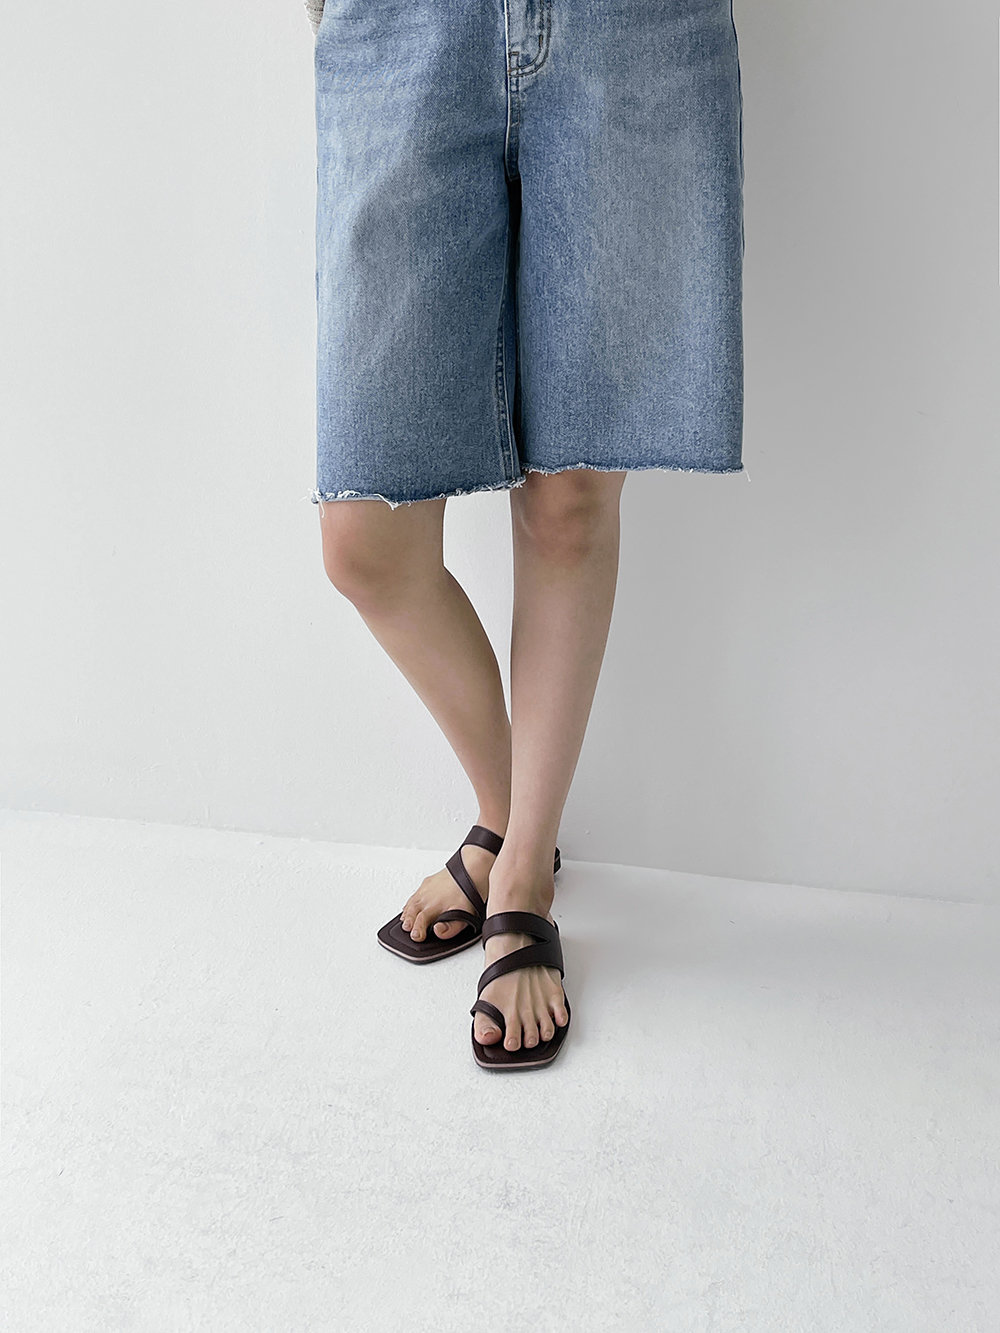 bass slippers